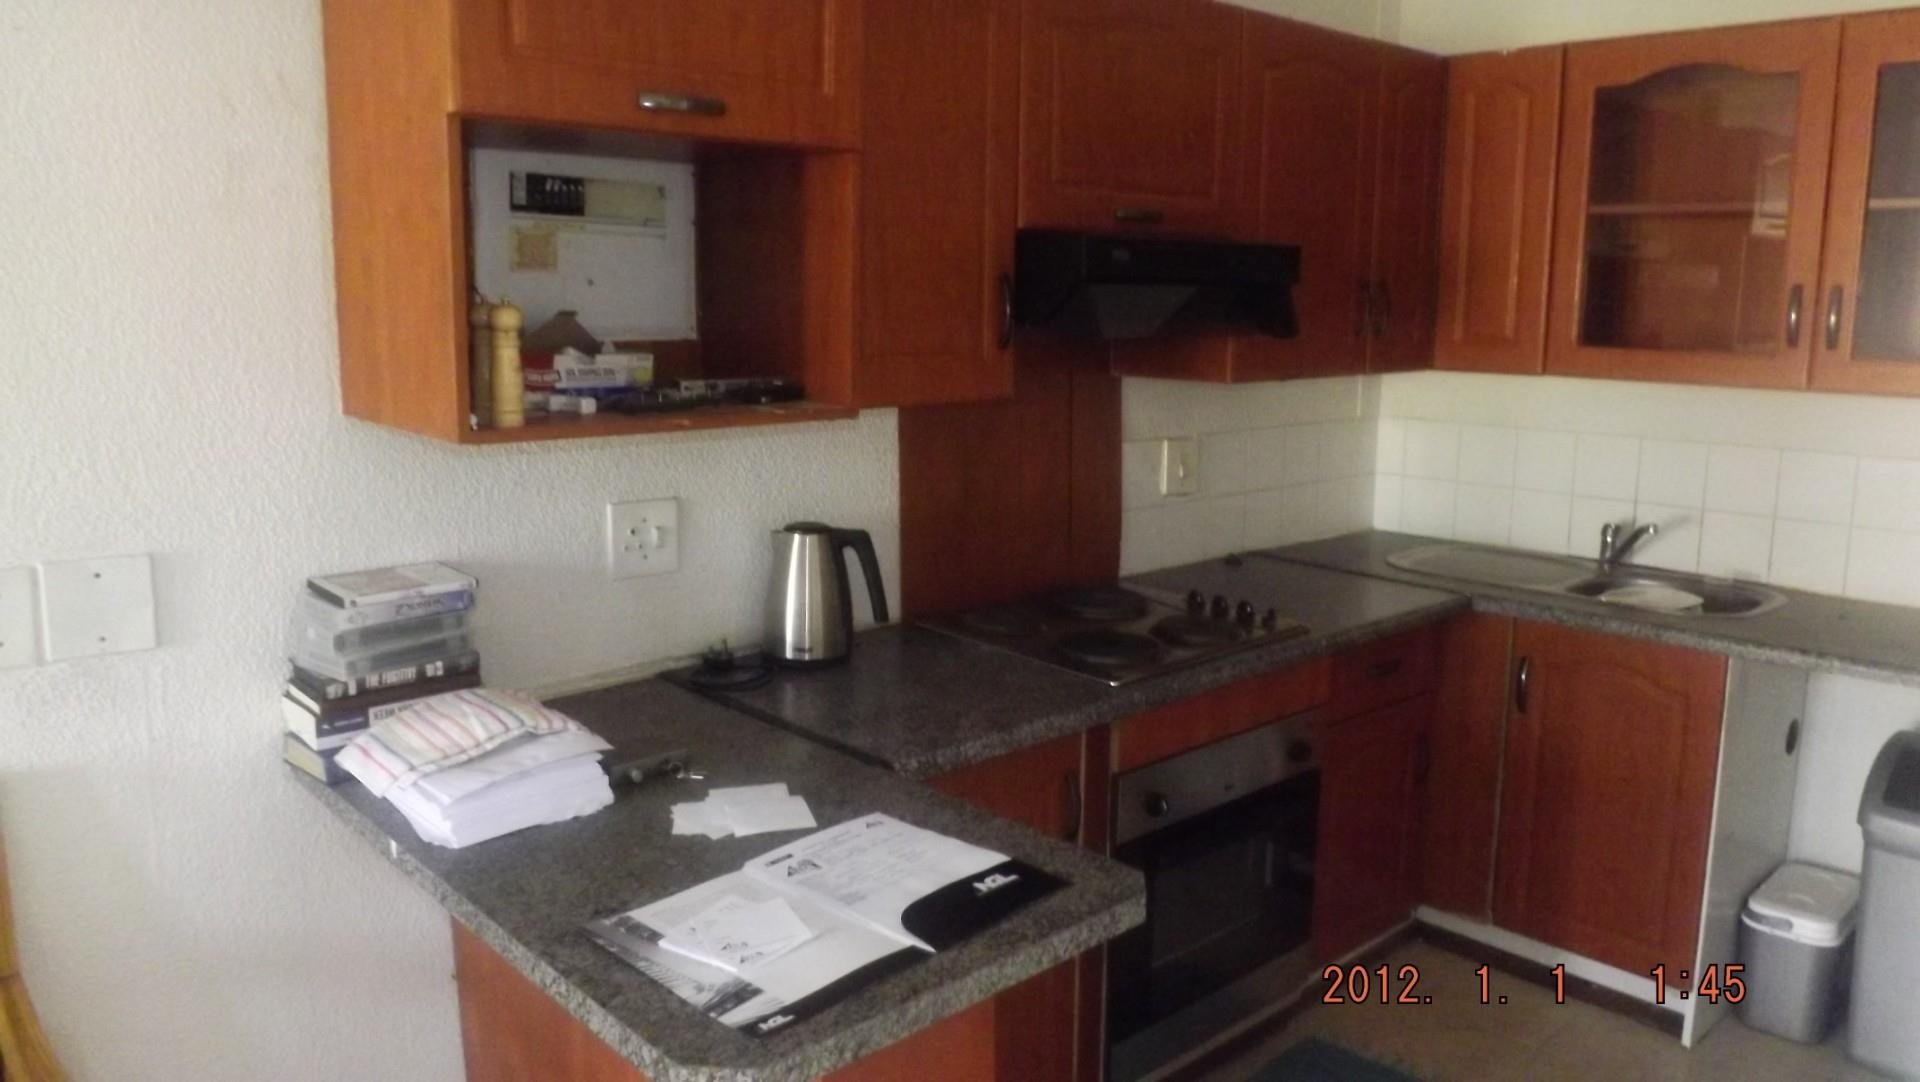 3 Bedroom Townhouse For Sale in Ridgeway